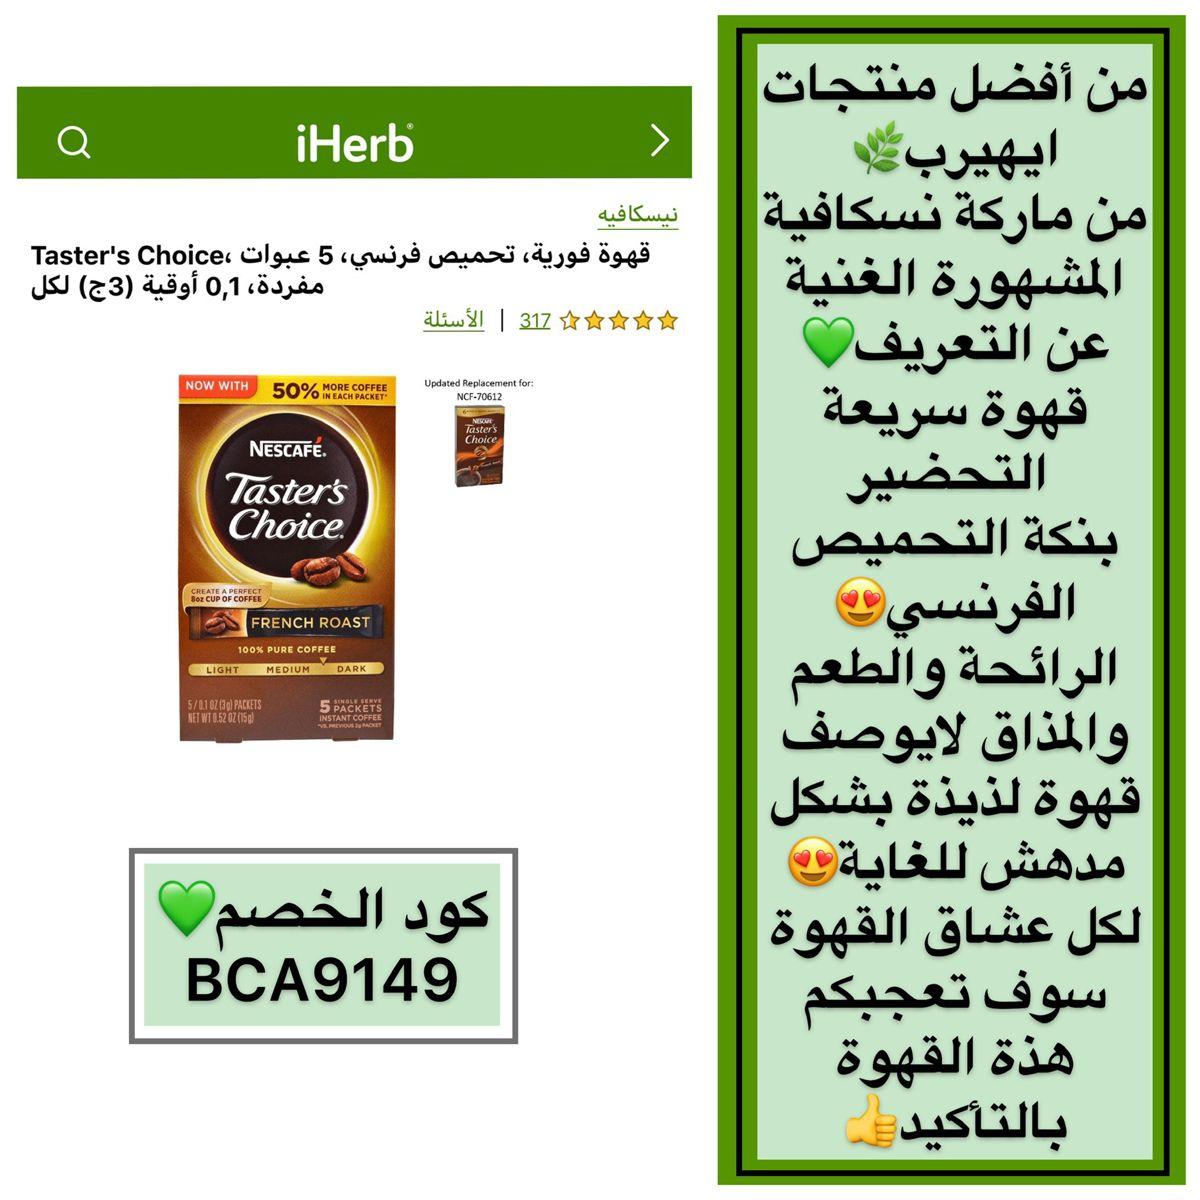 Nescafe Taster S Choice قهوة فورية تحميص فرنسي 5 عبوات مفردة 0 1 أوقية 3ج لكل Nescafe Instant Coffee French Roast